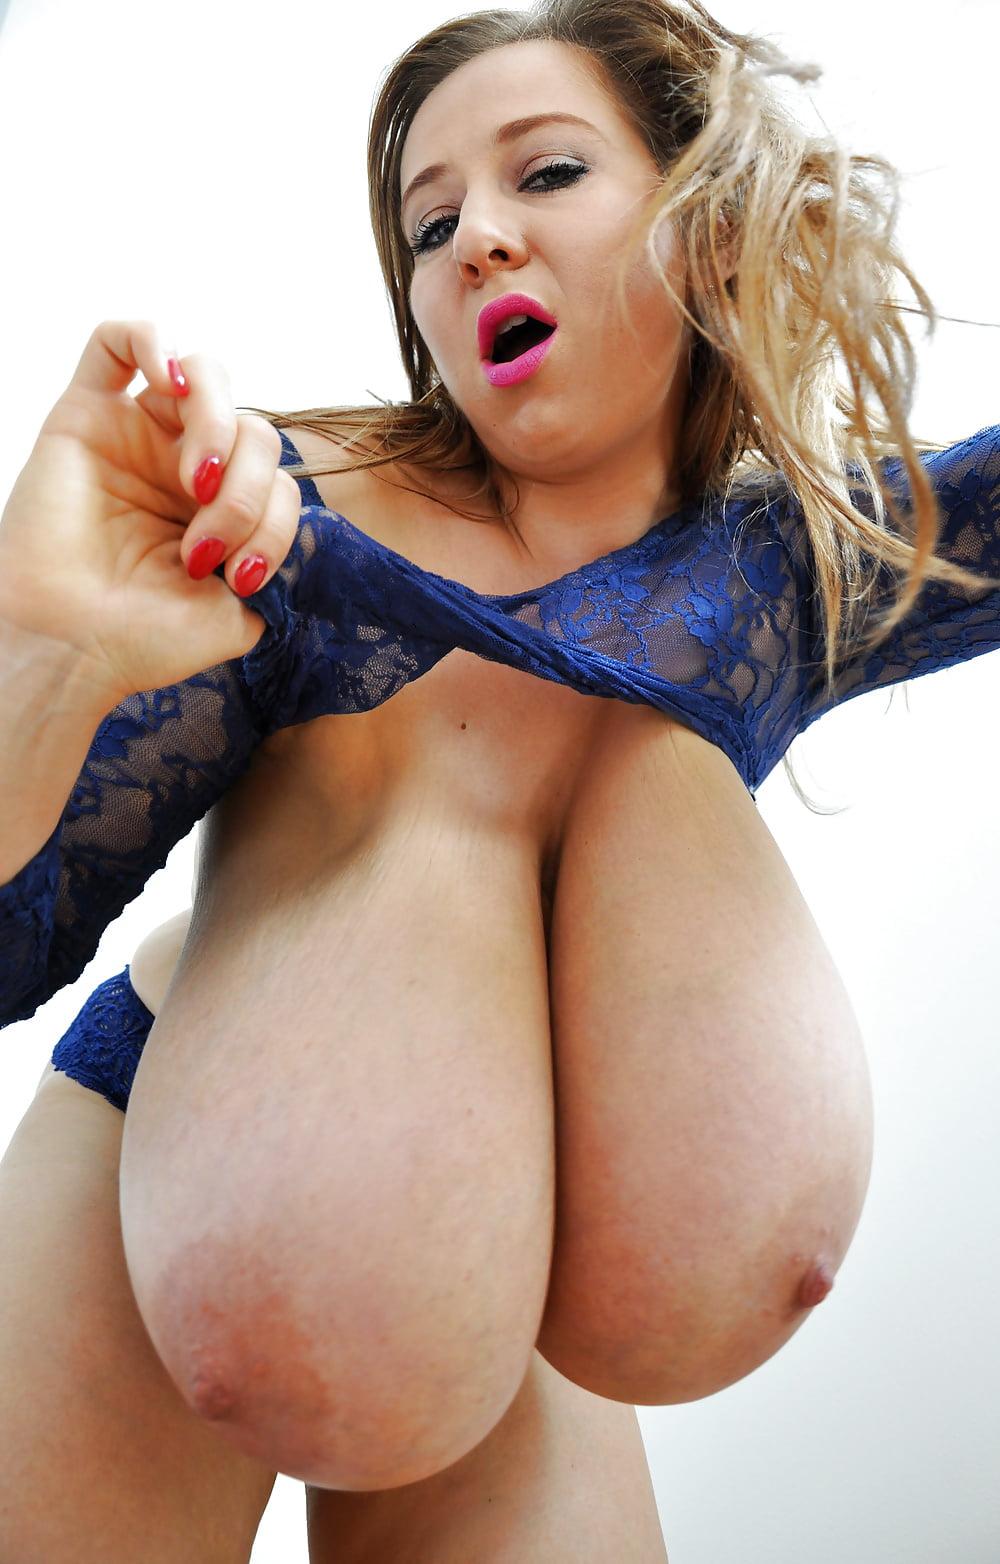 Real pics of beth chapman topless